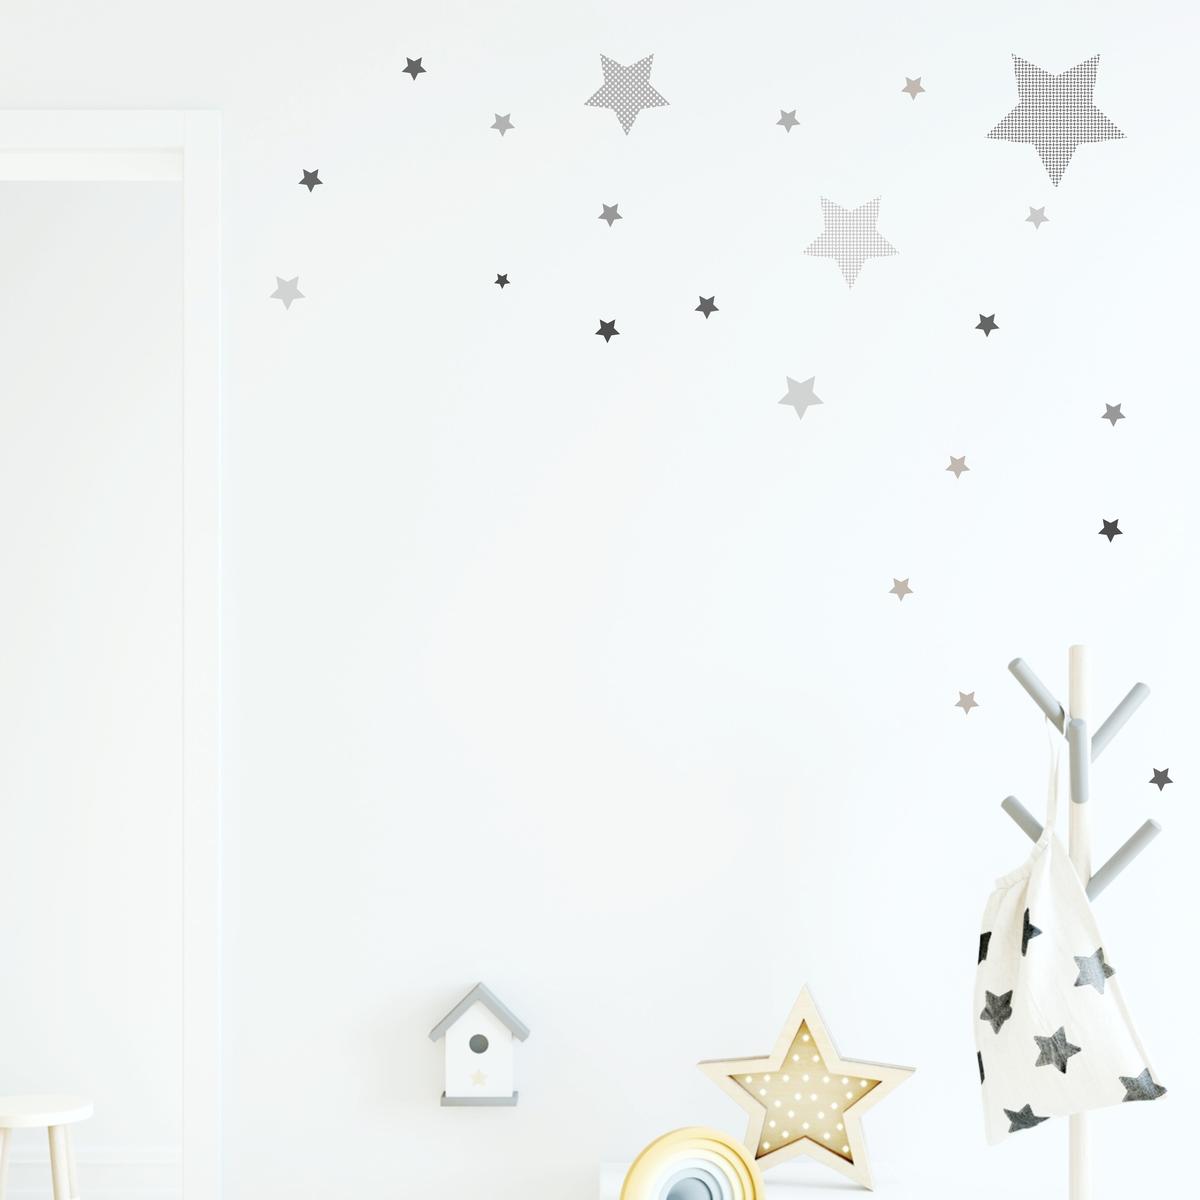 Full Size of Wandaufkleber Kinderzimmer Wandsticker Stern Sternen Set Grau Mit Mustern Regal Regale Weiß Sofa Kinderzimmer Wandaufkleber Kinderzimmer